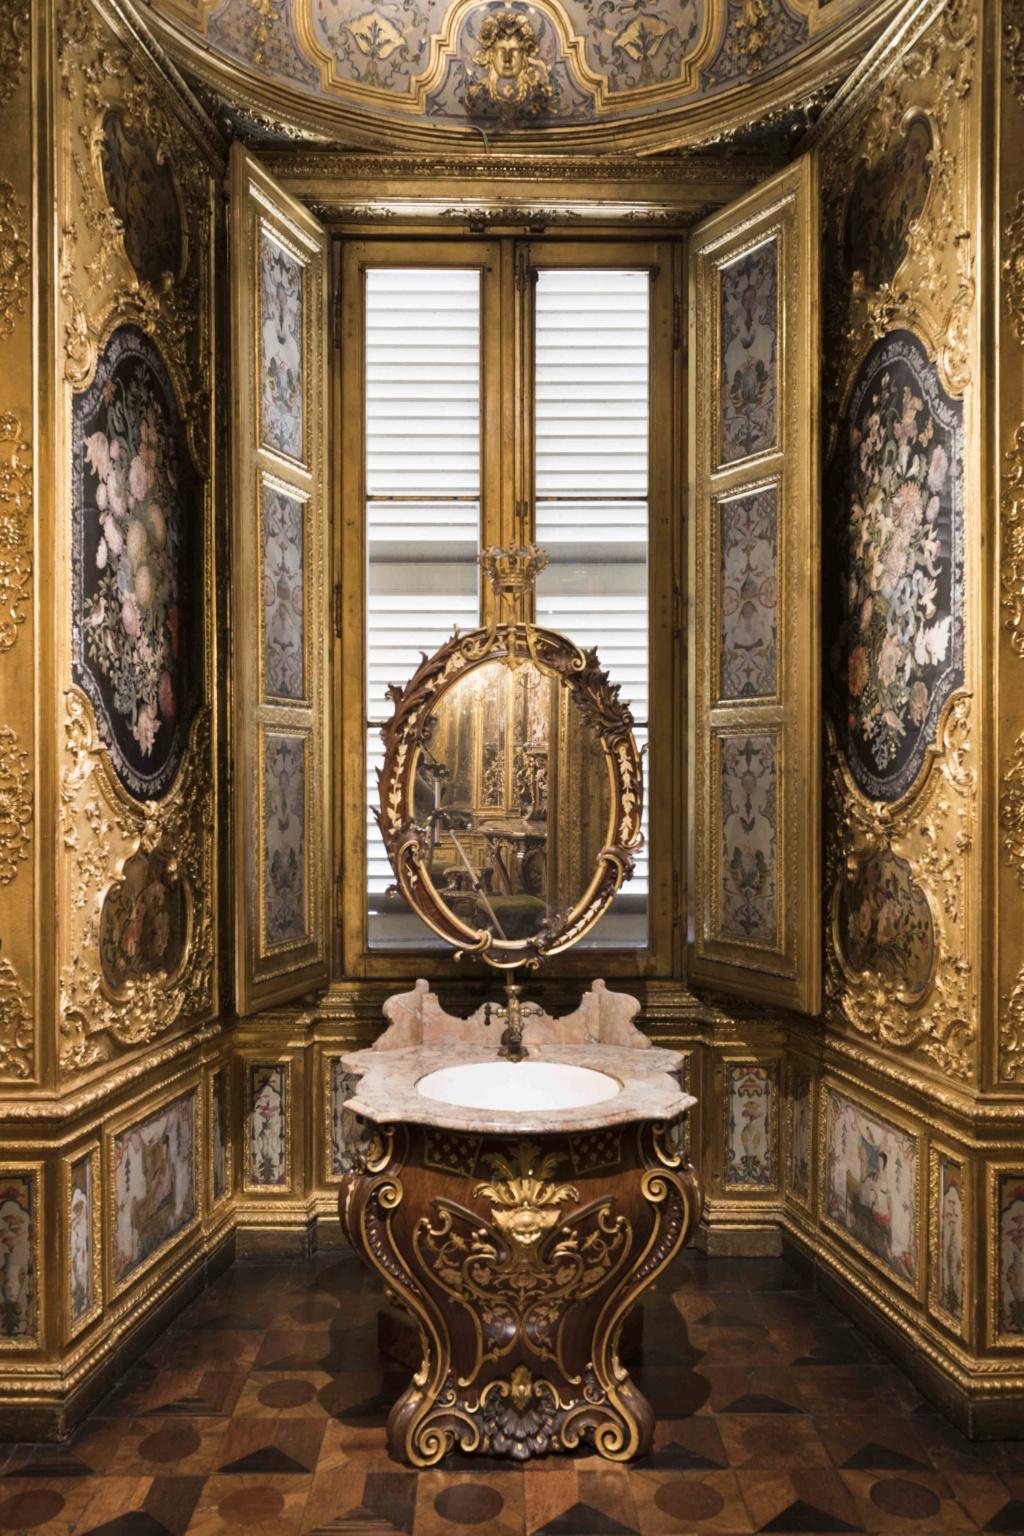 Le Palais royal de Turin (Palazzo Reale di Torino) 6b10